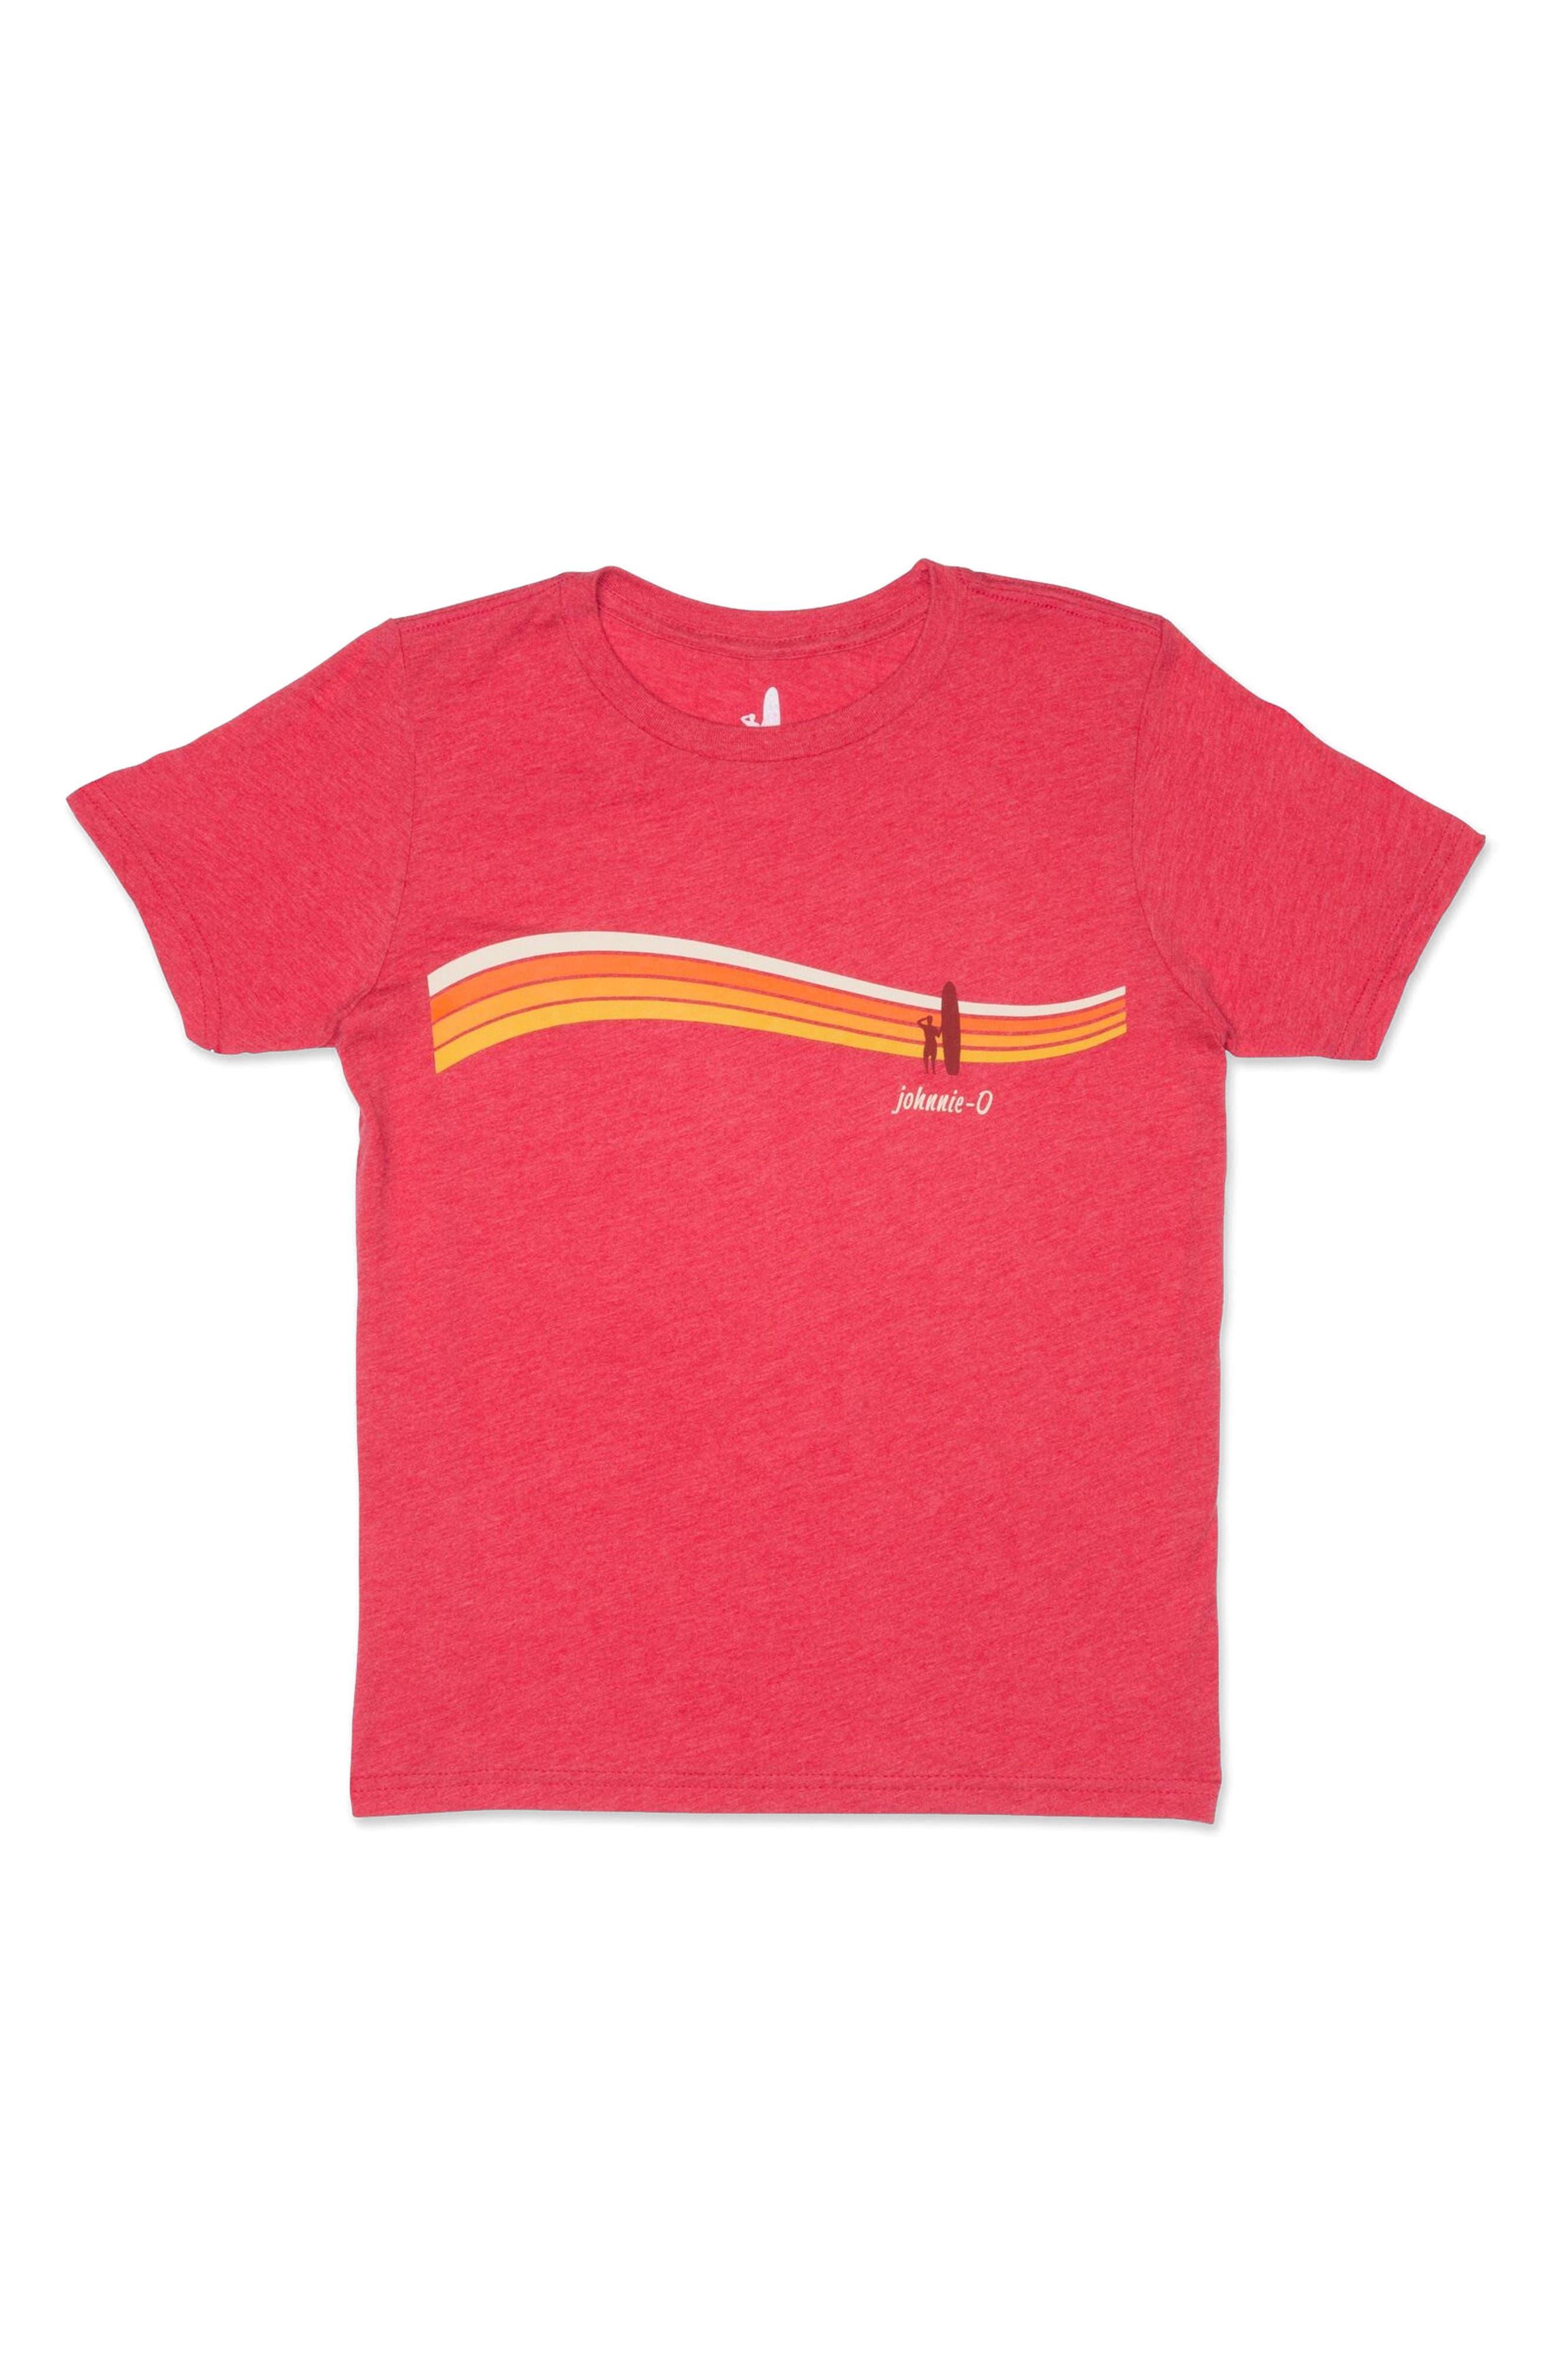 Greer Graphic T-Shirt,                         Main,                         color, Malibu Red